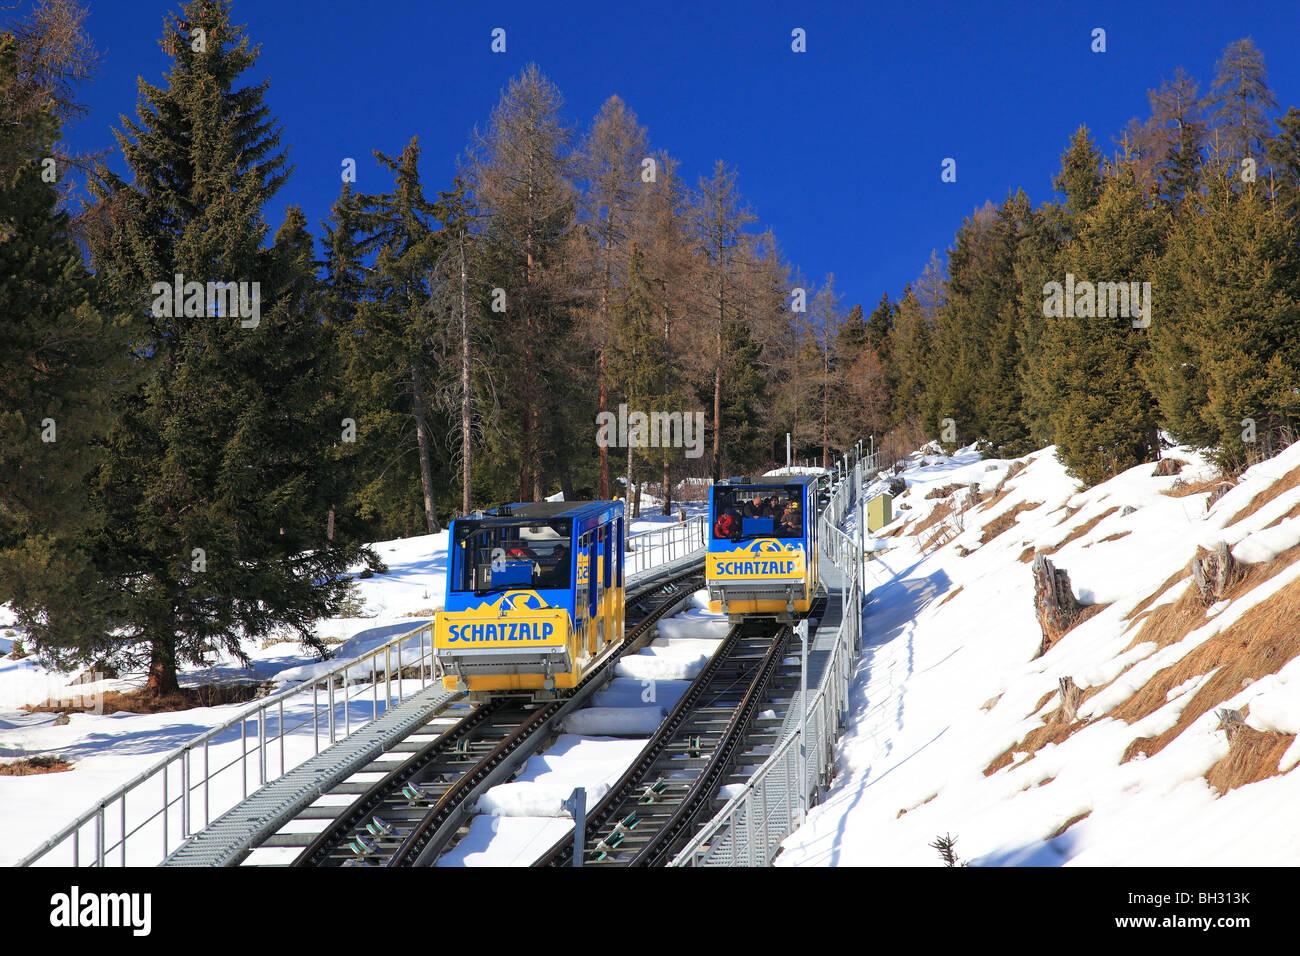 Schatzalp Bahn Bahnhof Davos, Schweiz Stockbild